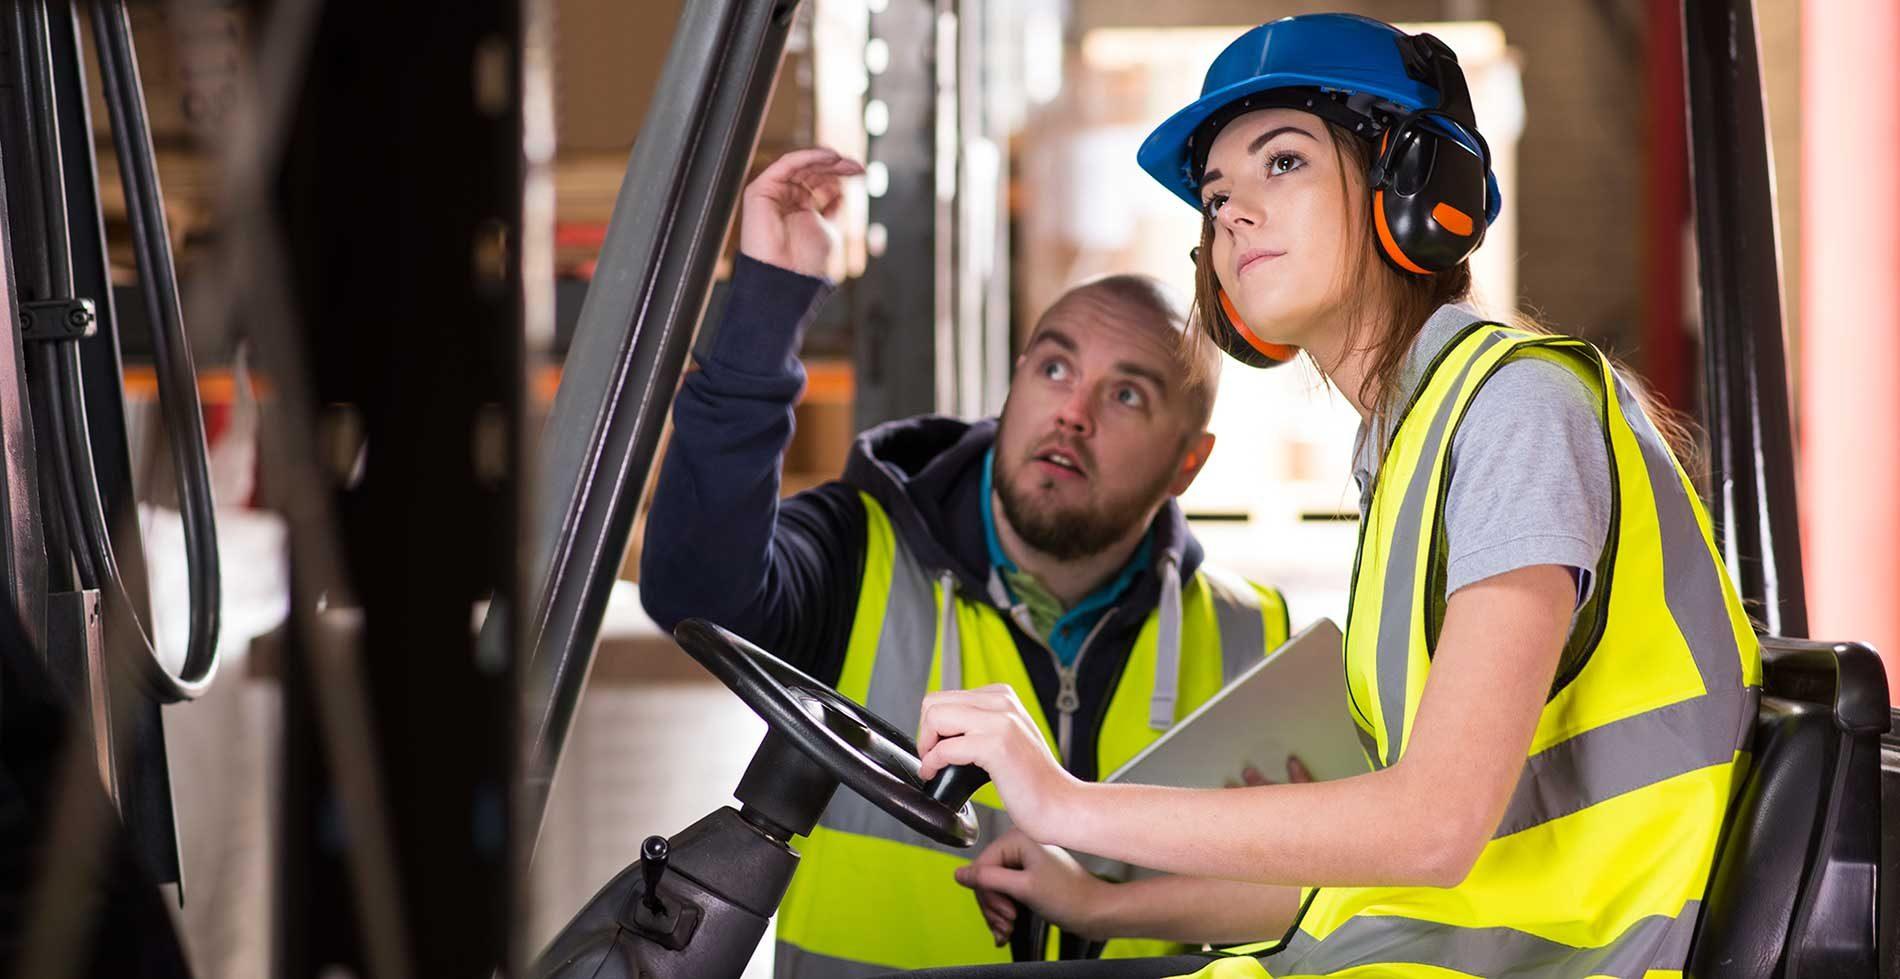 Forklift Training Wrkfr 338 Clover Park Technical College